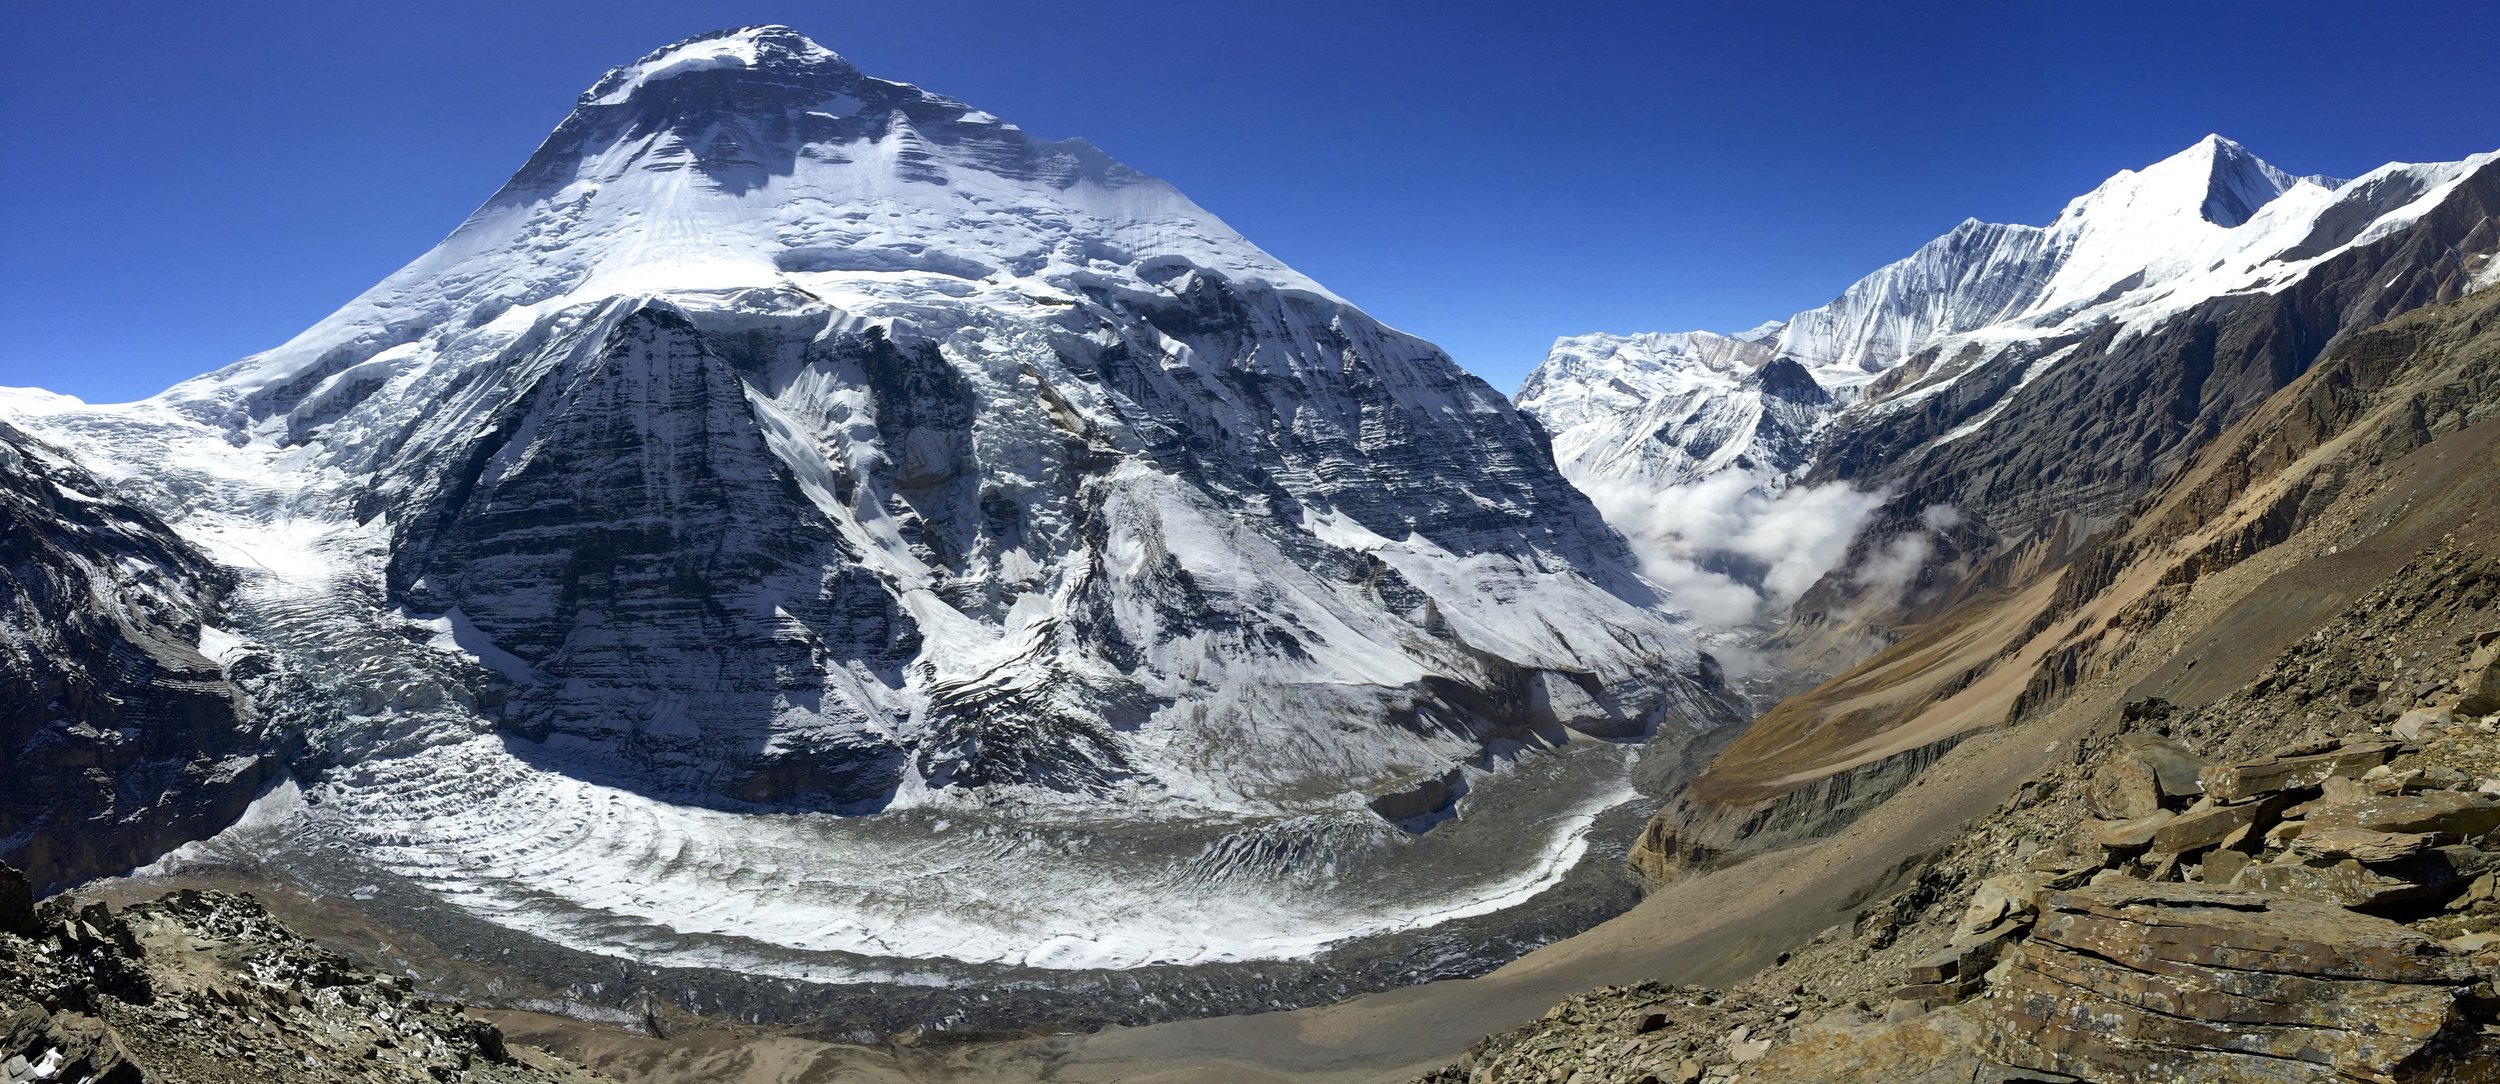 The panorama of Dhaulagiri I and the Dhaulagiri Glacier.